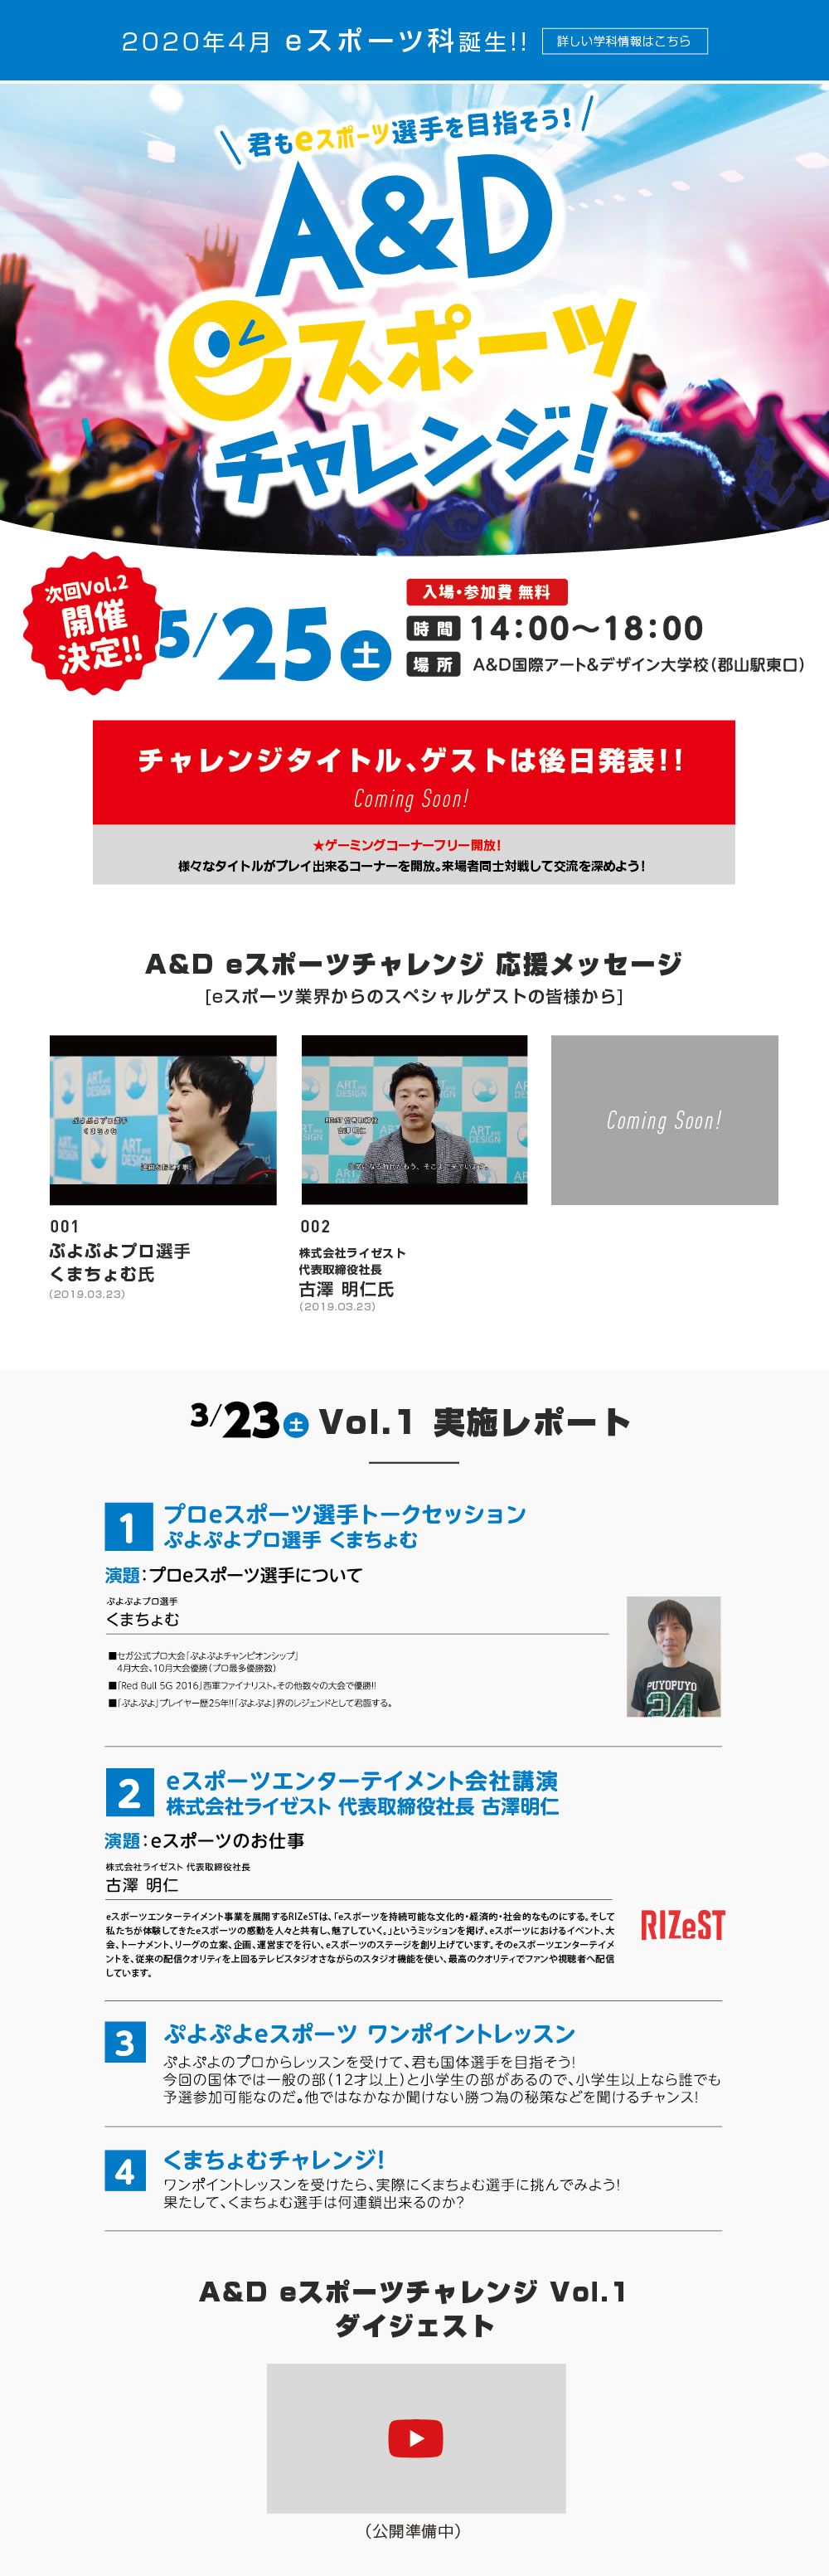 A&D eスポーツチャレンジ Vol.01